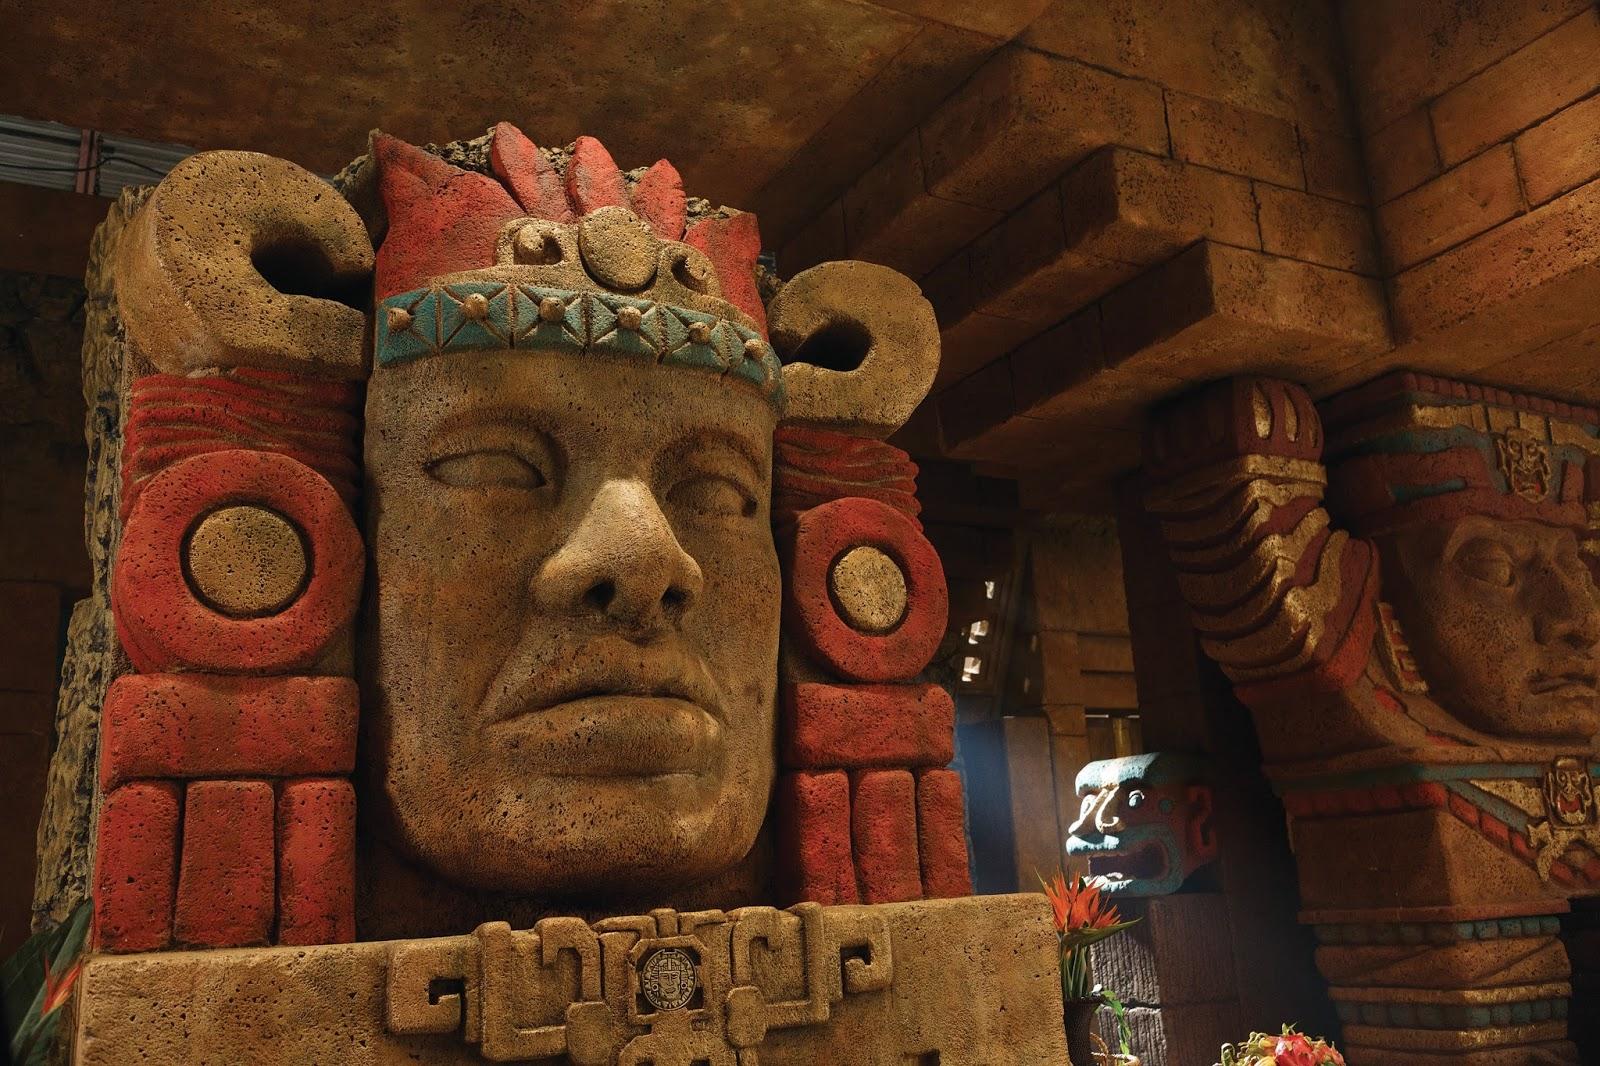 Legends-Of-The-Hidden-Temple-TV-Movie-Film-Event-Special-Nickelodeon-Asia-Nick-Olmec-Dee-Bradley-Baker-LOTHT-Press_3.jpg